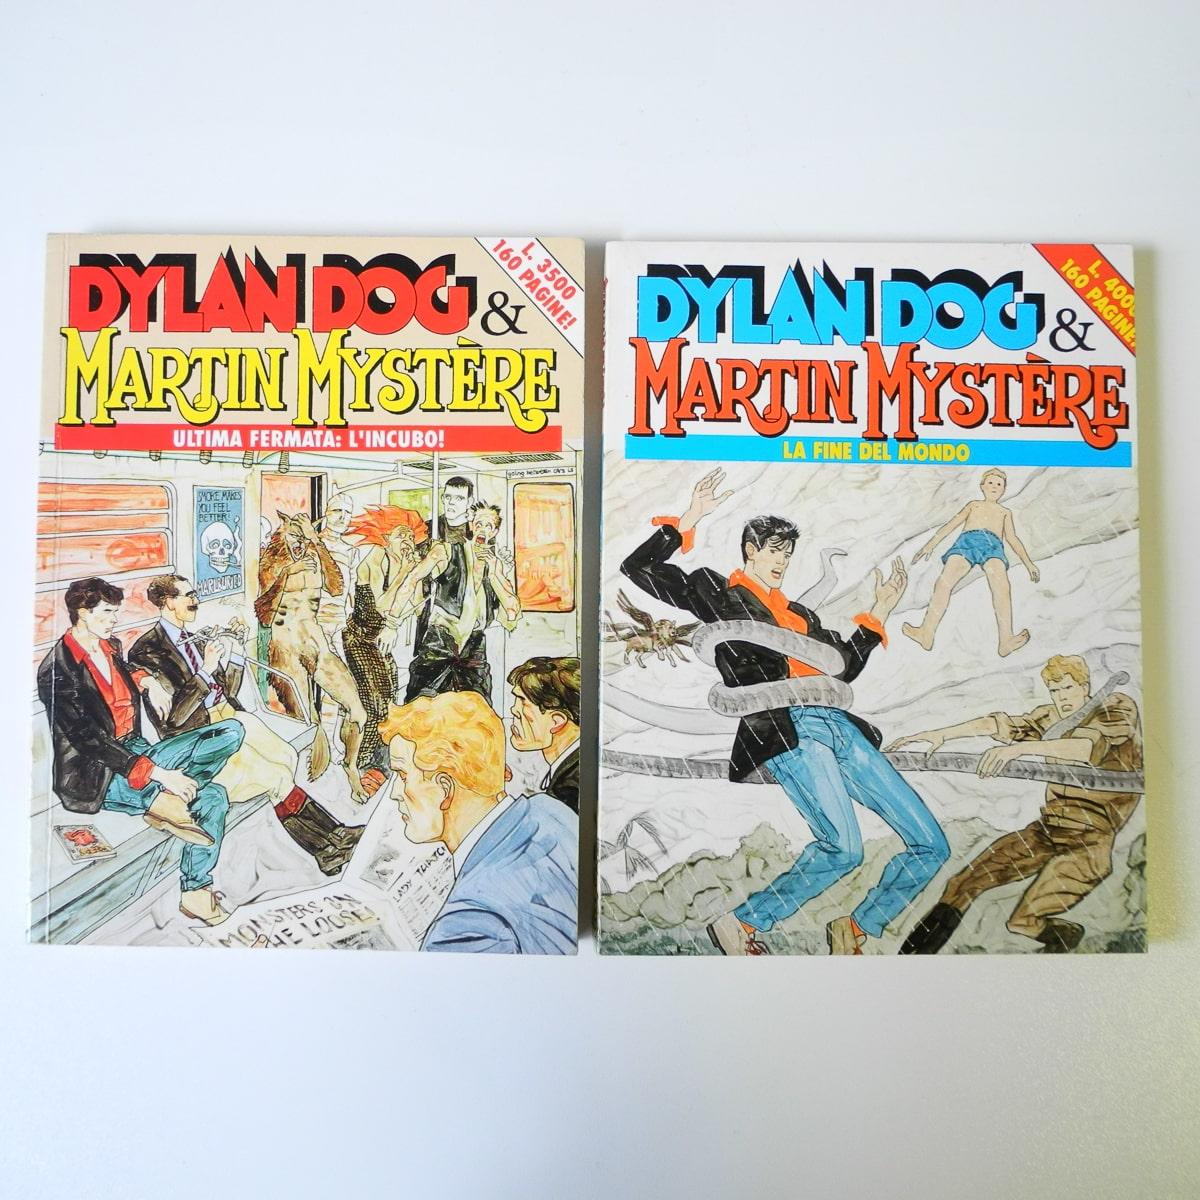 Dylan Dog & Martin Mystere Bonelli (2)